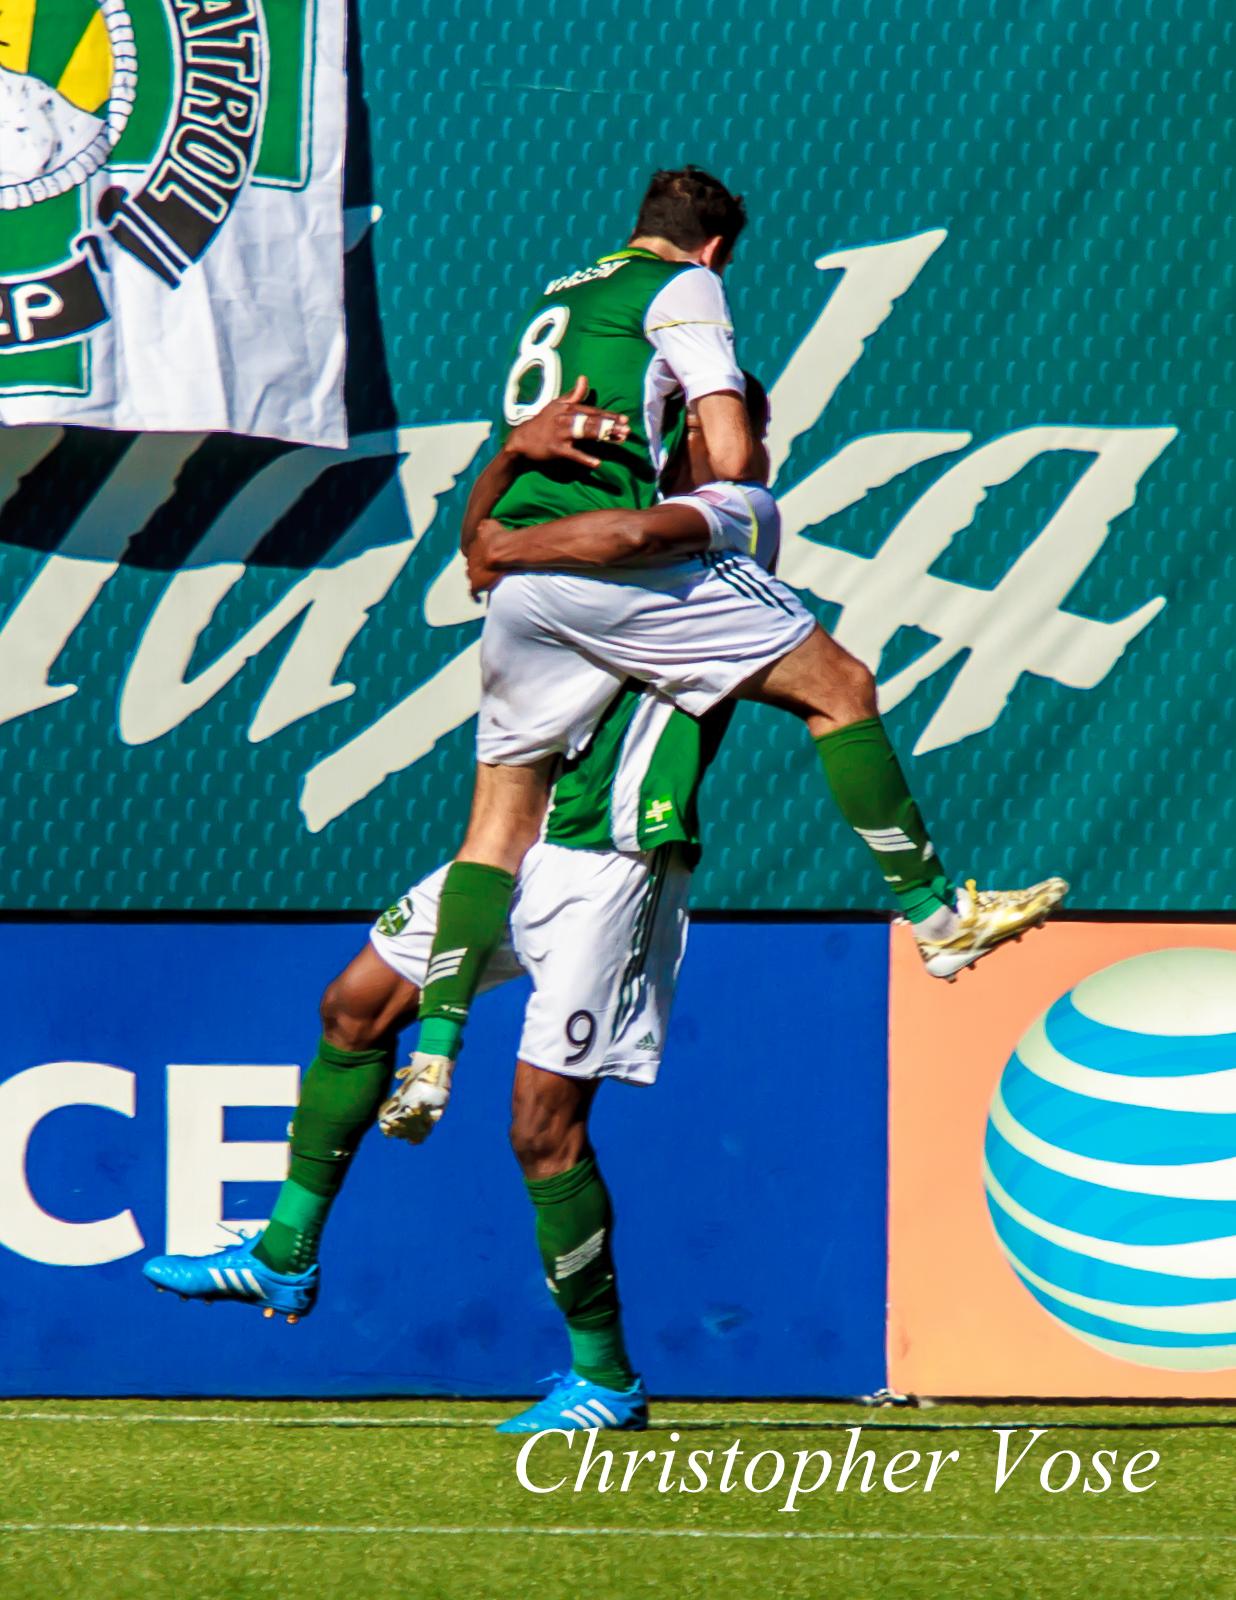 2014-09-20 Fanendo Adi's Second Goal Celebration.jpg